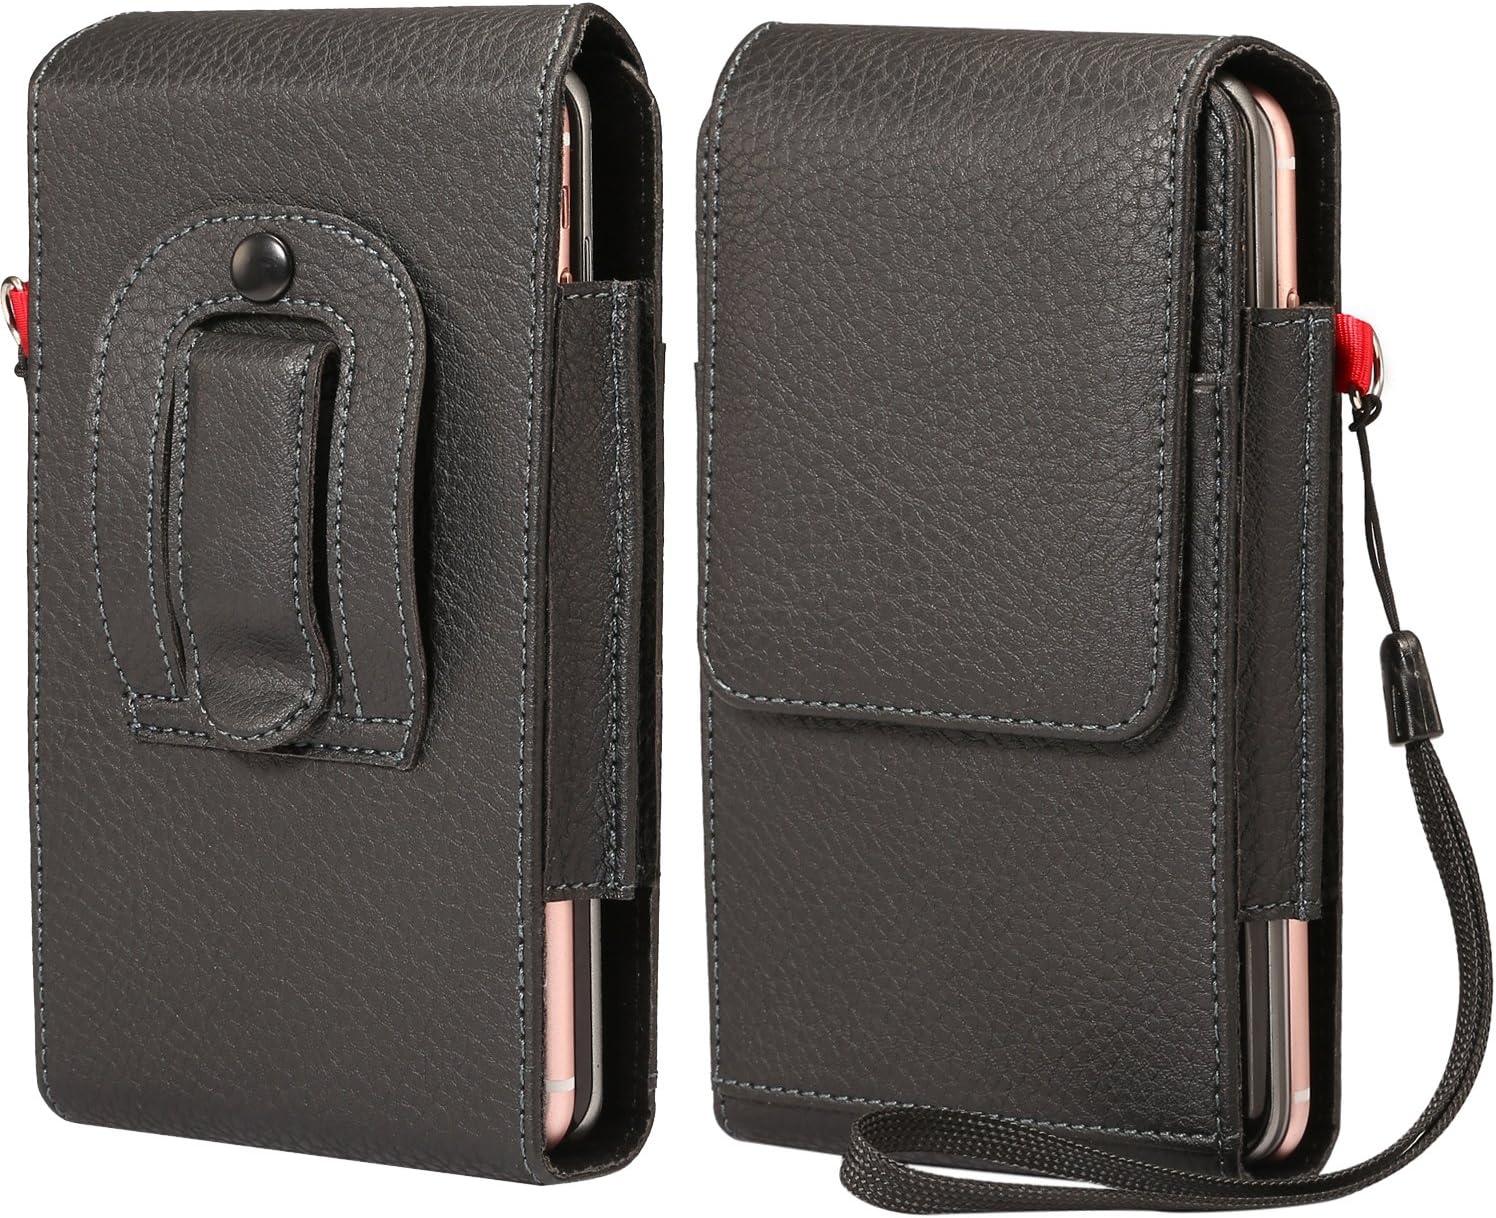 Workout Faux Leather Phone Belt Clip Holster Card Slots Pouch Case for LG Stylo 4 Plus/Stylo 4 / V40 ThinQ / G7 ThinQ/HTC U12+ / U12 Life / U11 Eyes/BLU R2 Plus/ViVo X/ViVo XL+ / XL3 Plus